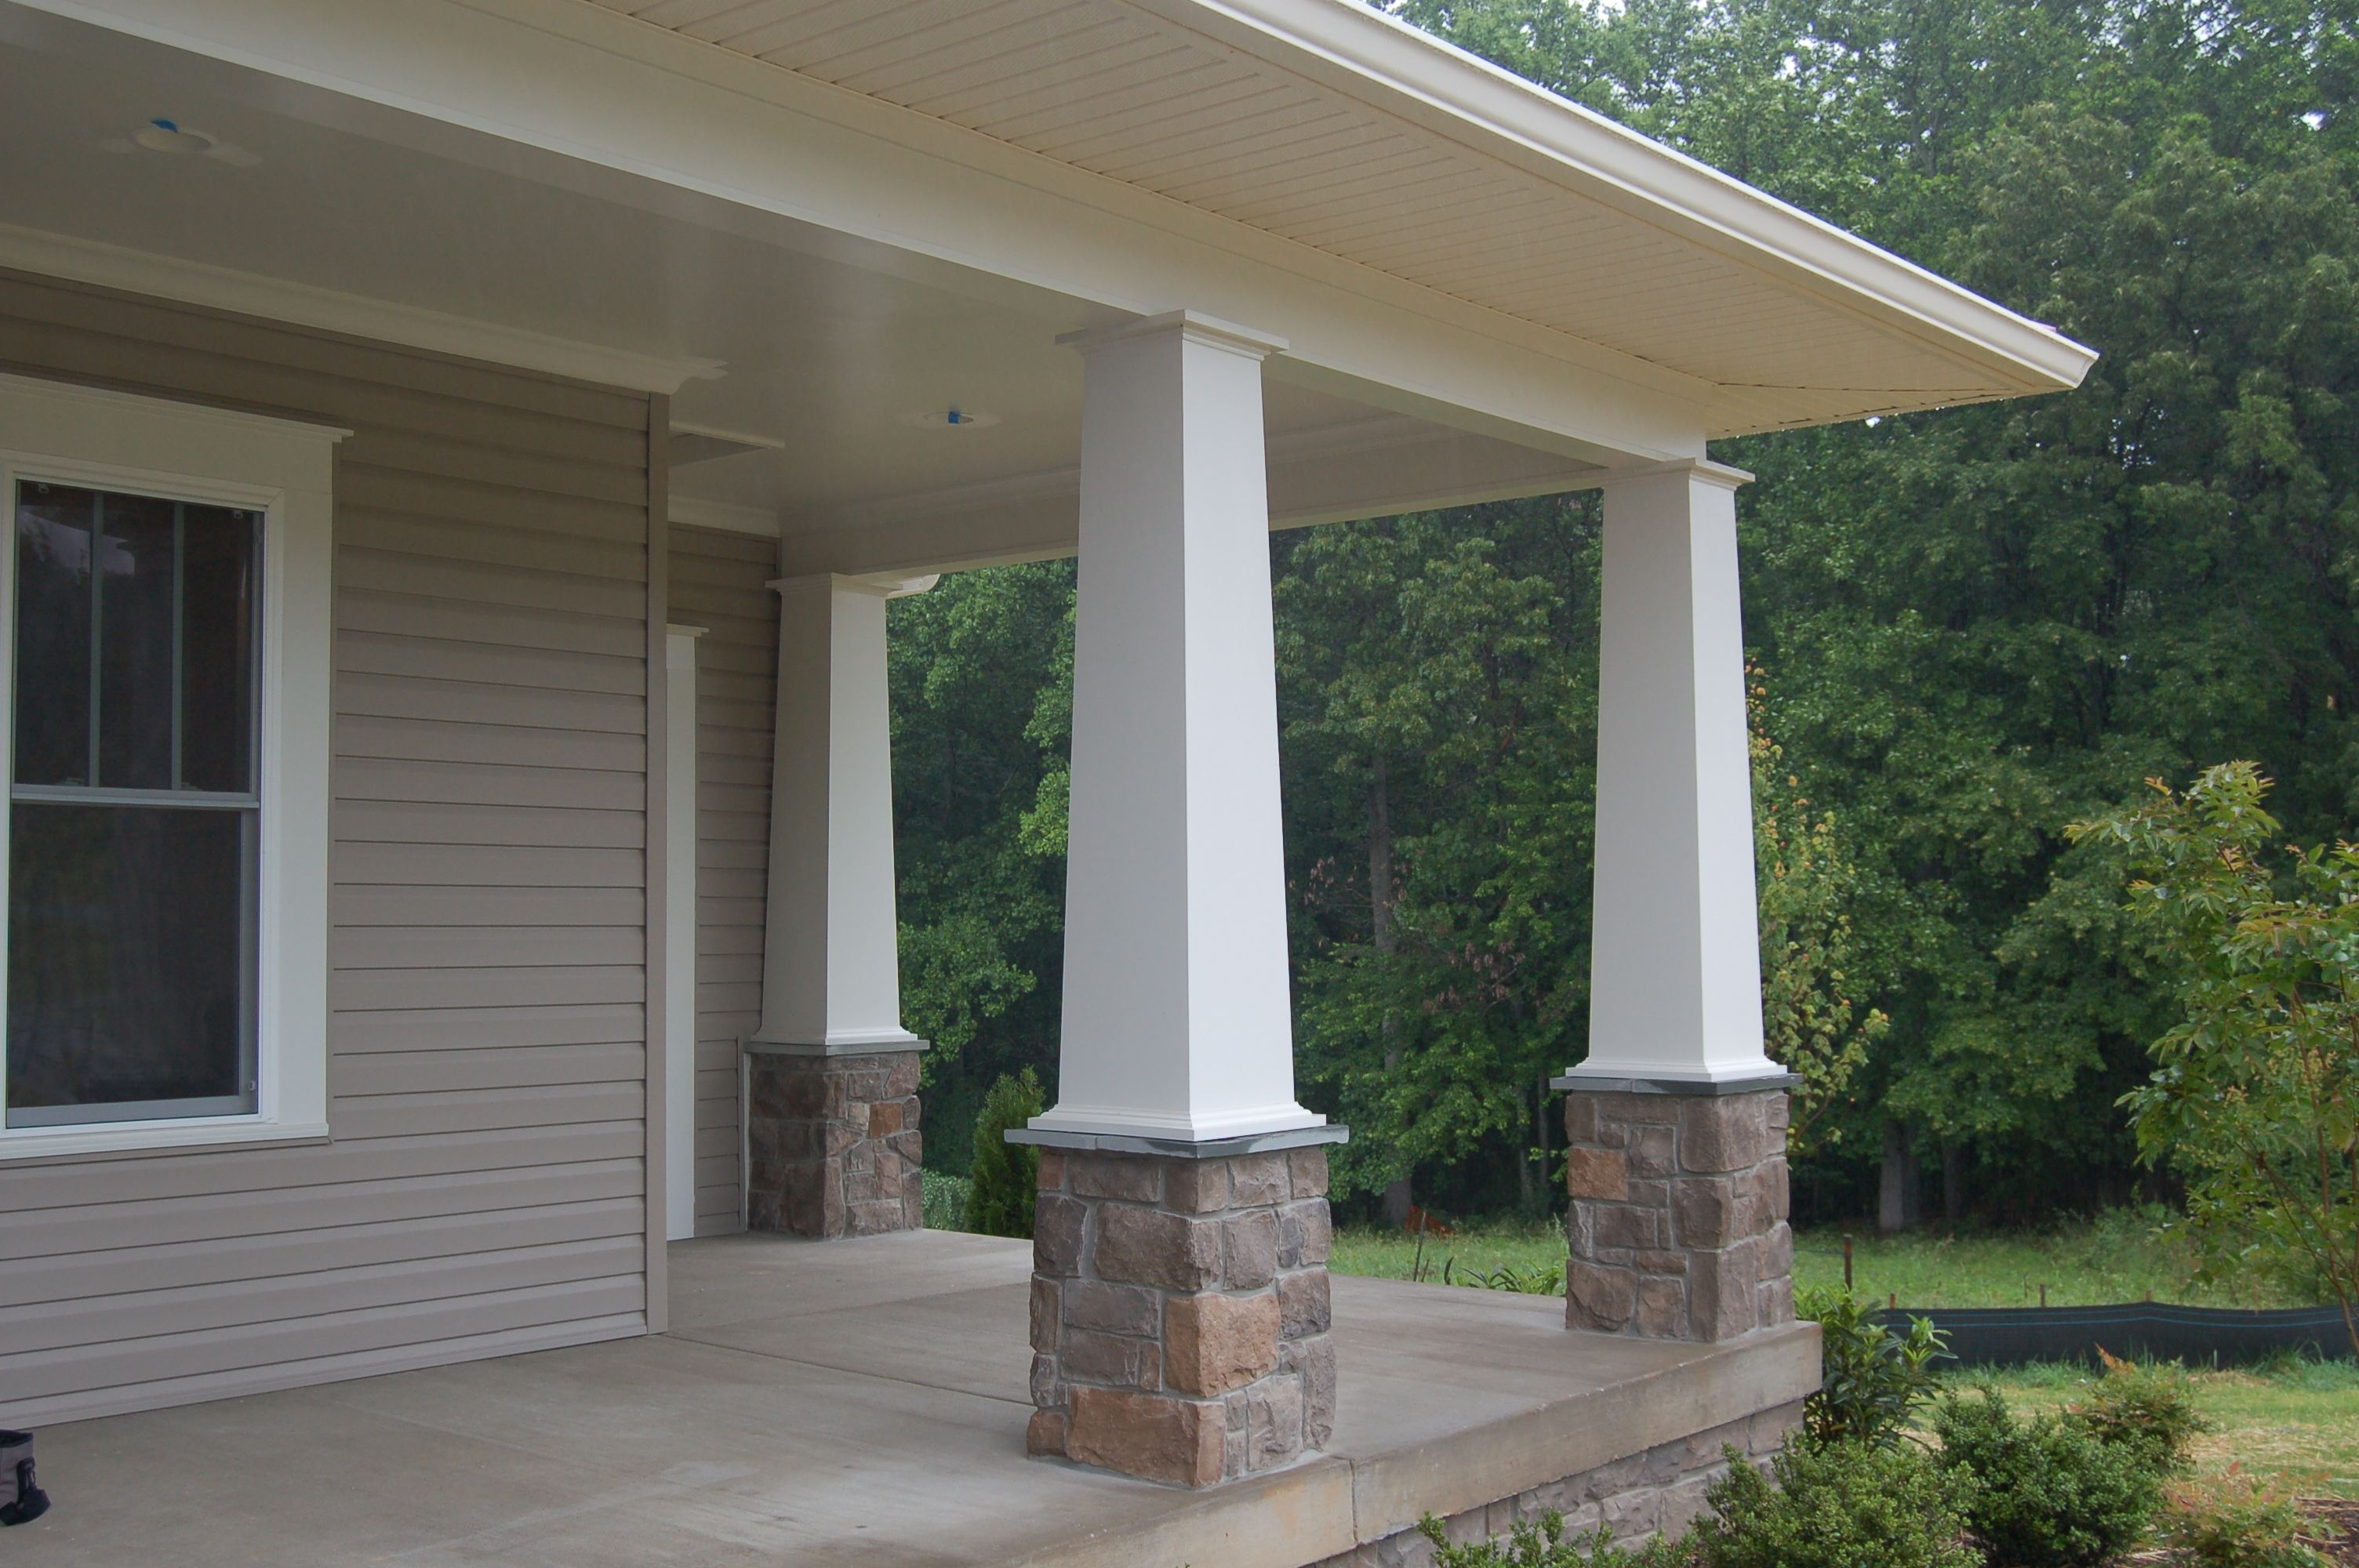 Quaker Kelsea Model With Stone Columns Front Porch